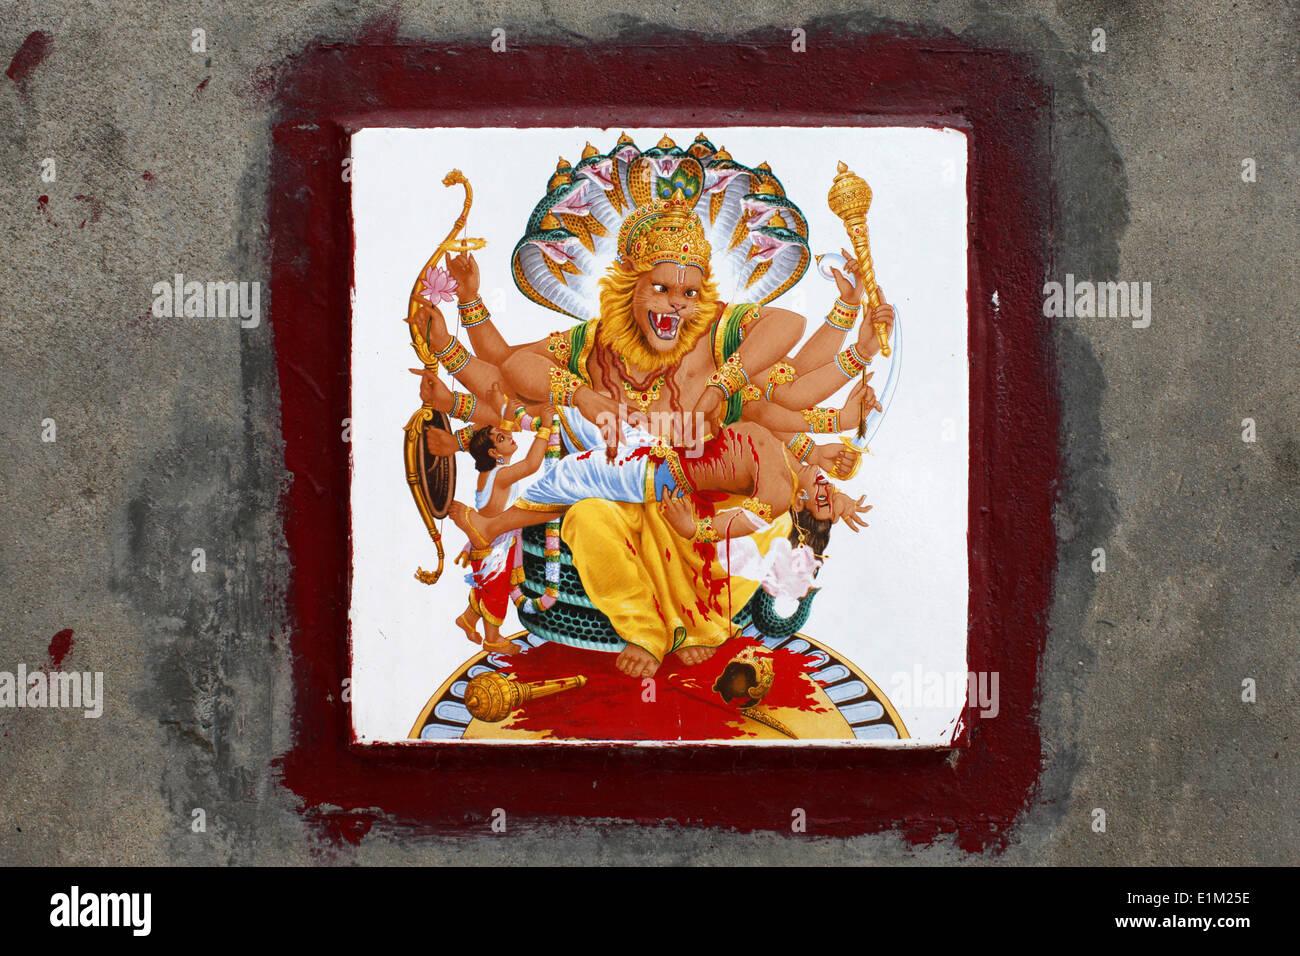 Mosaic on a bathing ghat depicting nara simha avatar of vishnu killing hiranyakashipu on